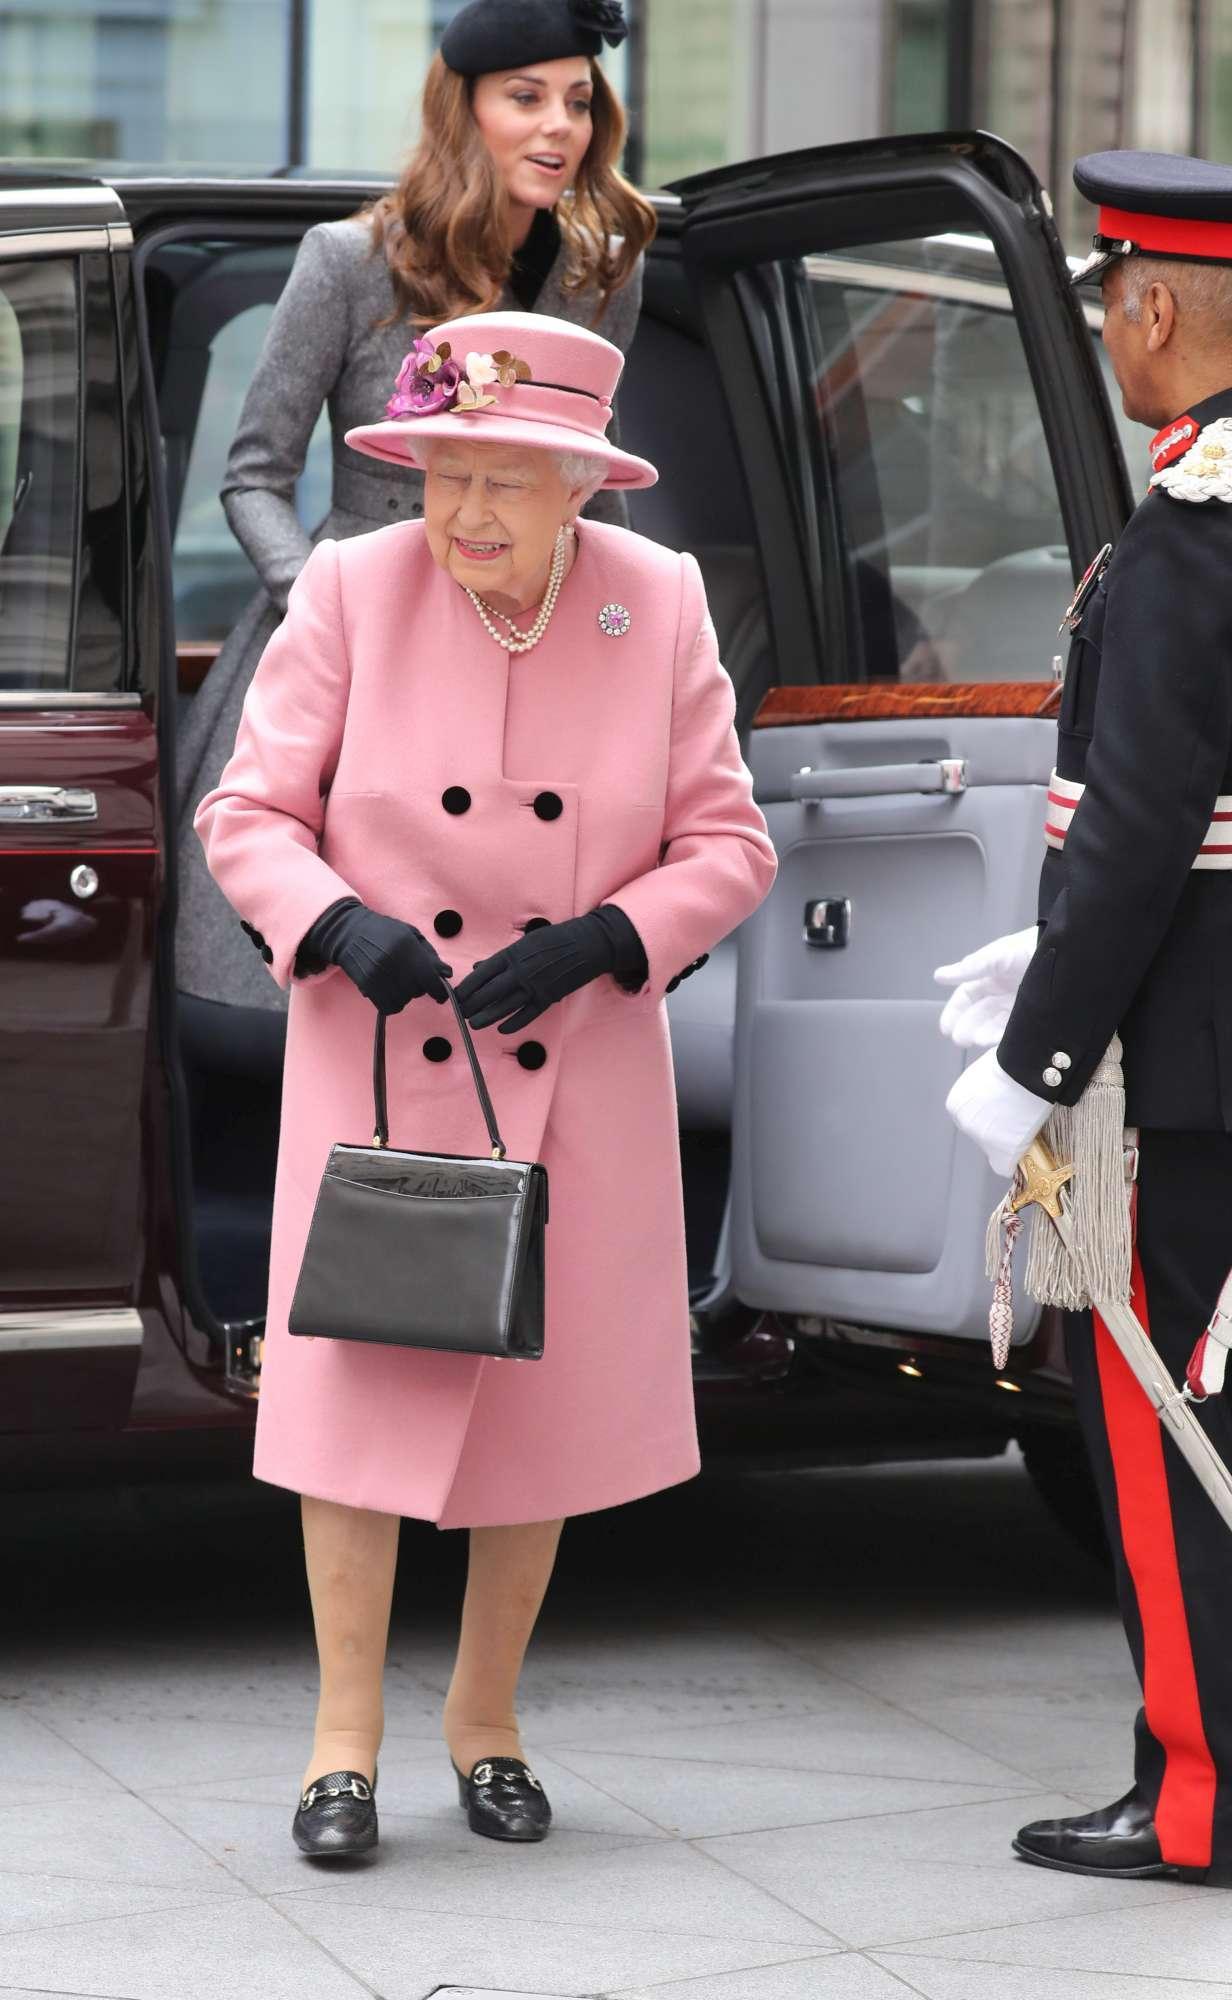 Kate Middleton insieme alla Regina a Londra, la prima uscita da sole